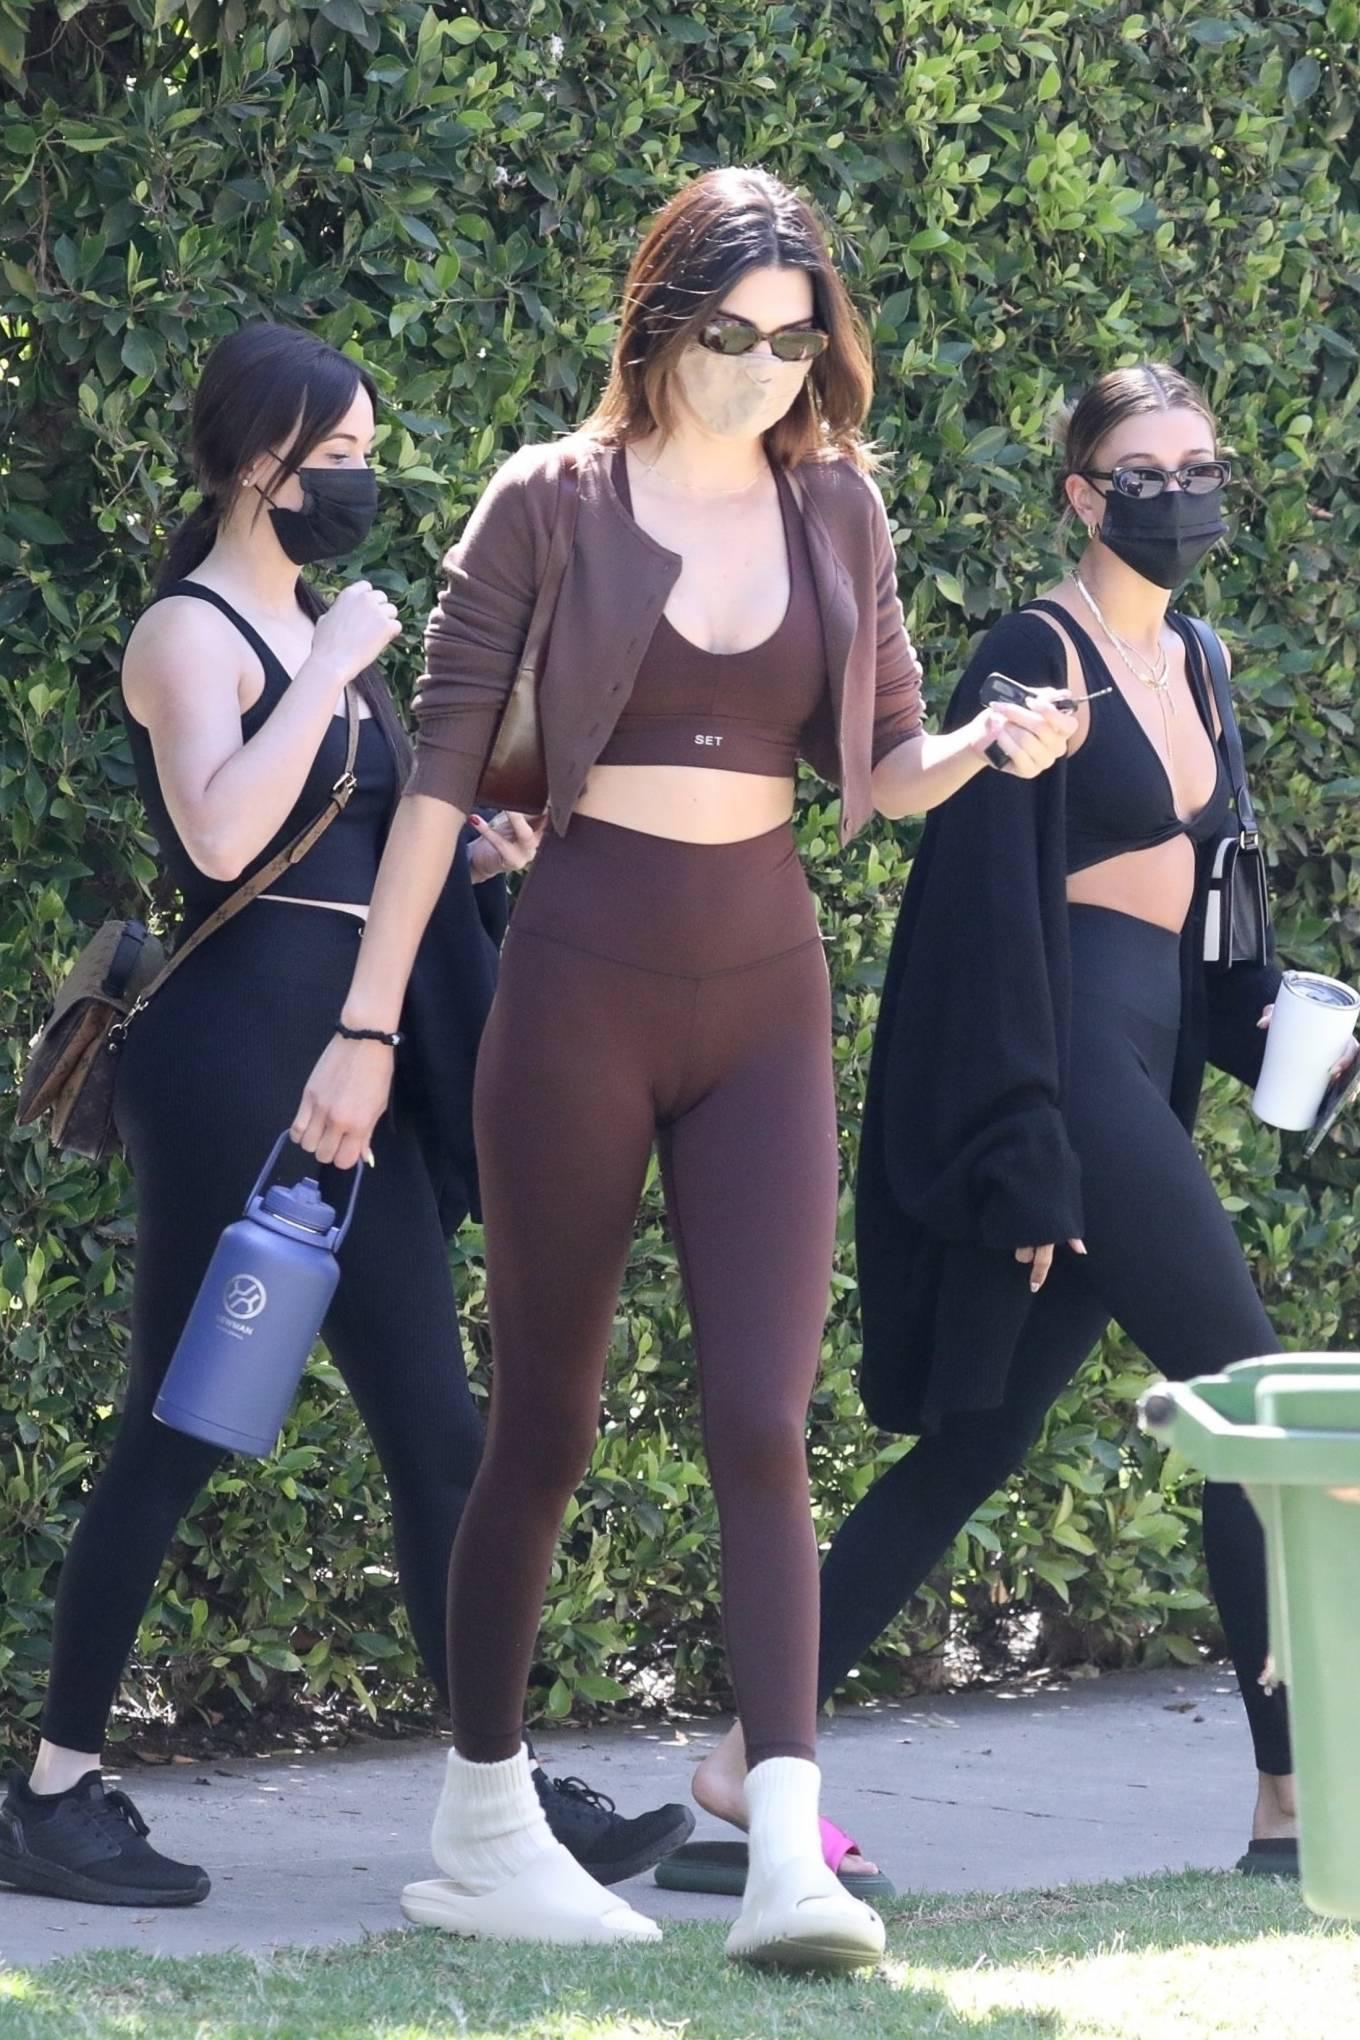 Kendall Jenner donning figure hugging brown high waist workout leggings